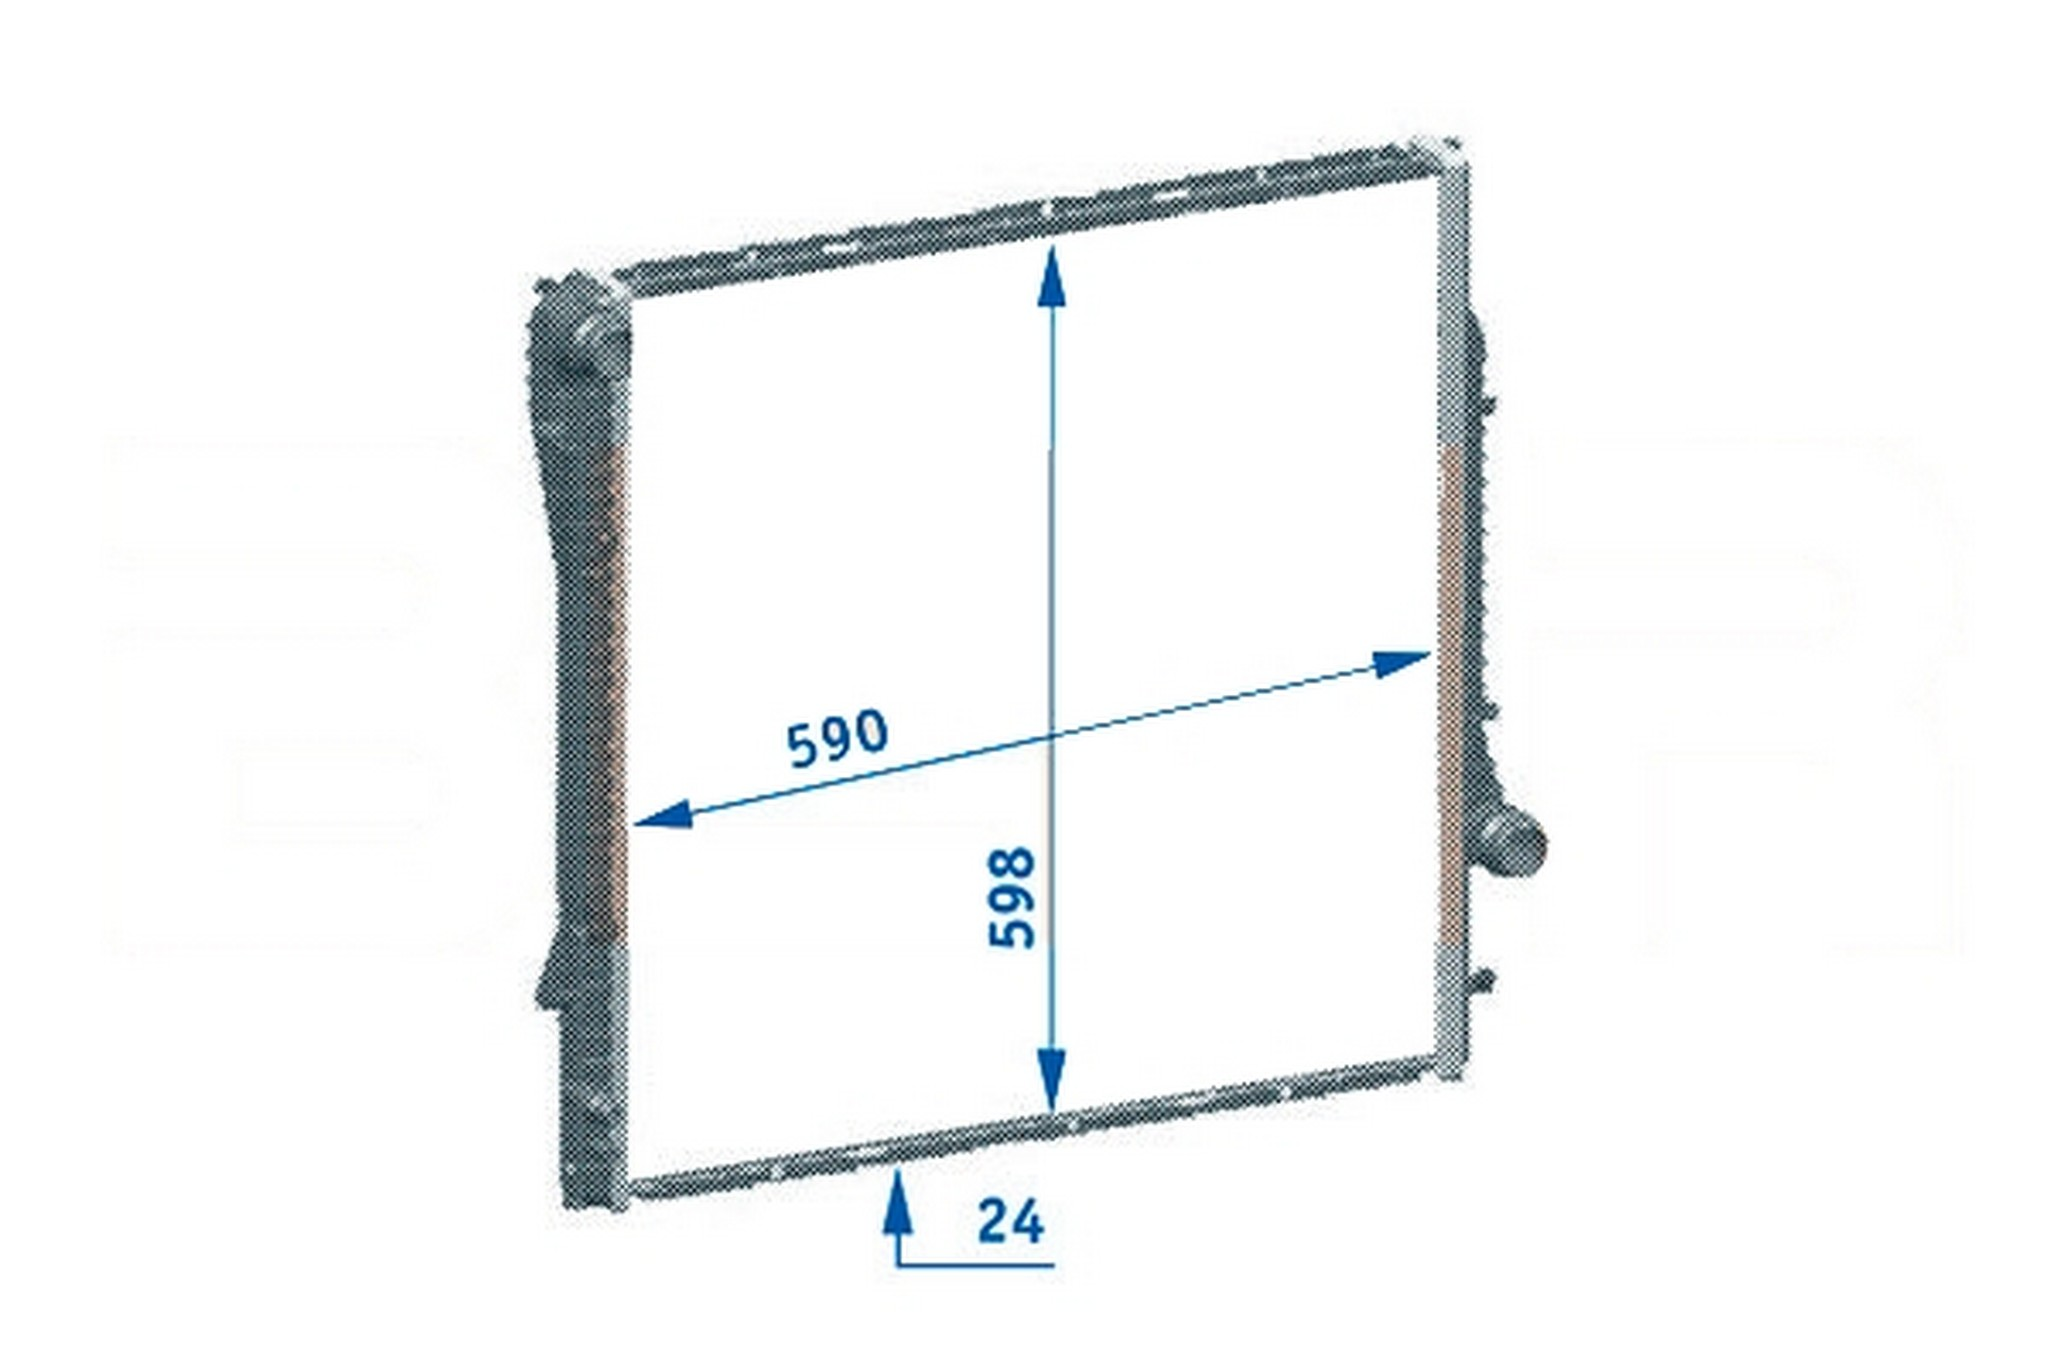 2002 Bmw X5 Radiator Diagram Reveolution Of Wiring Front Fuse Box Autopartskart Com Rh Cooling System Door